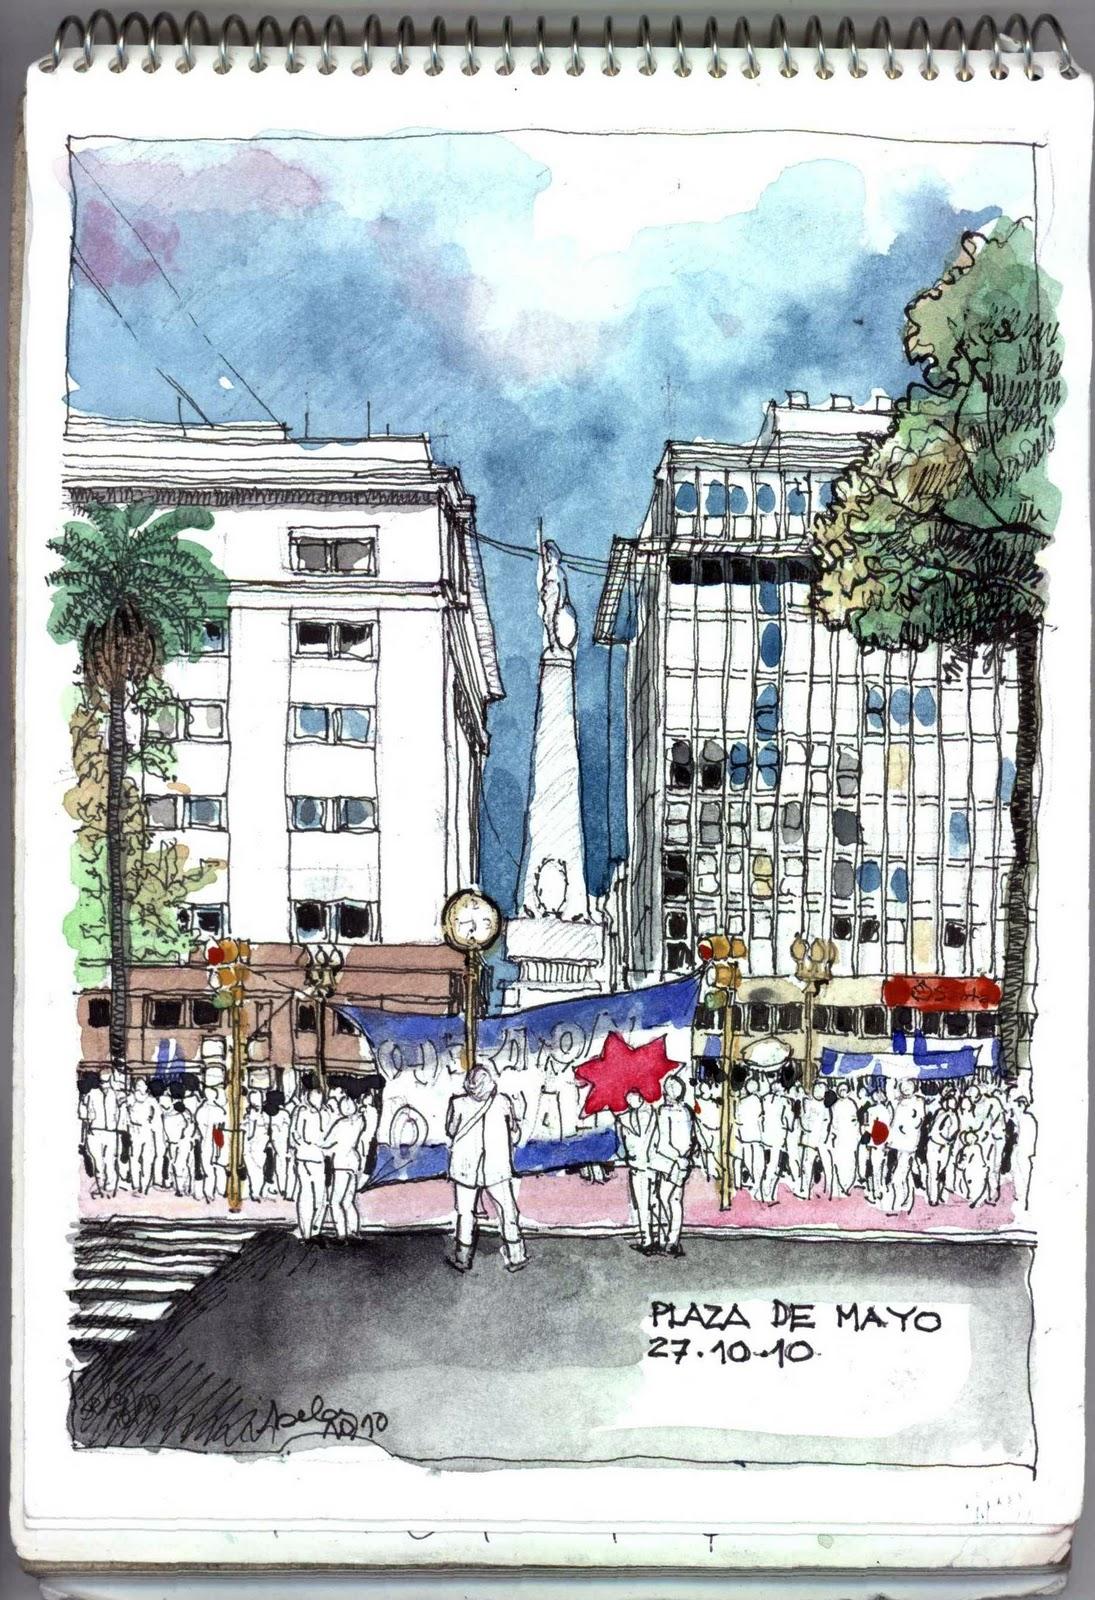 http://4.bp.blogspot.com/-Tcc8ArSnMMs/Tr_vRvGtIbI/AAAAAAAAAQI/V80qyT2nWL8/s1600/plazamayo_funeral_a.jpg